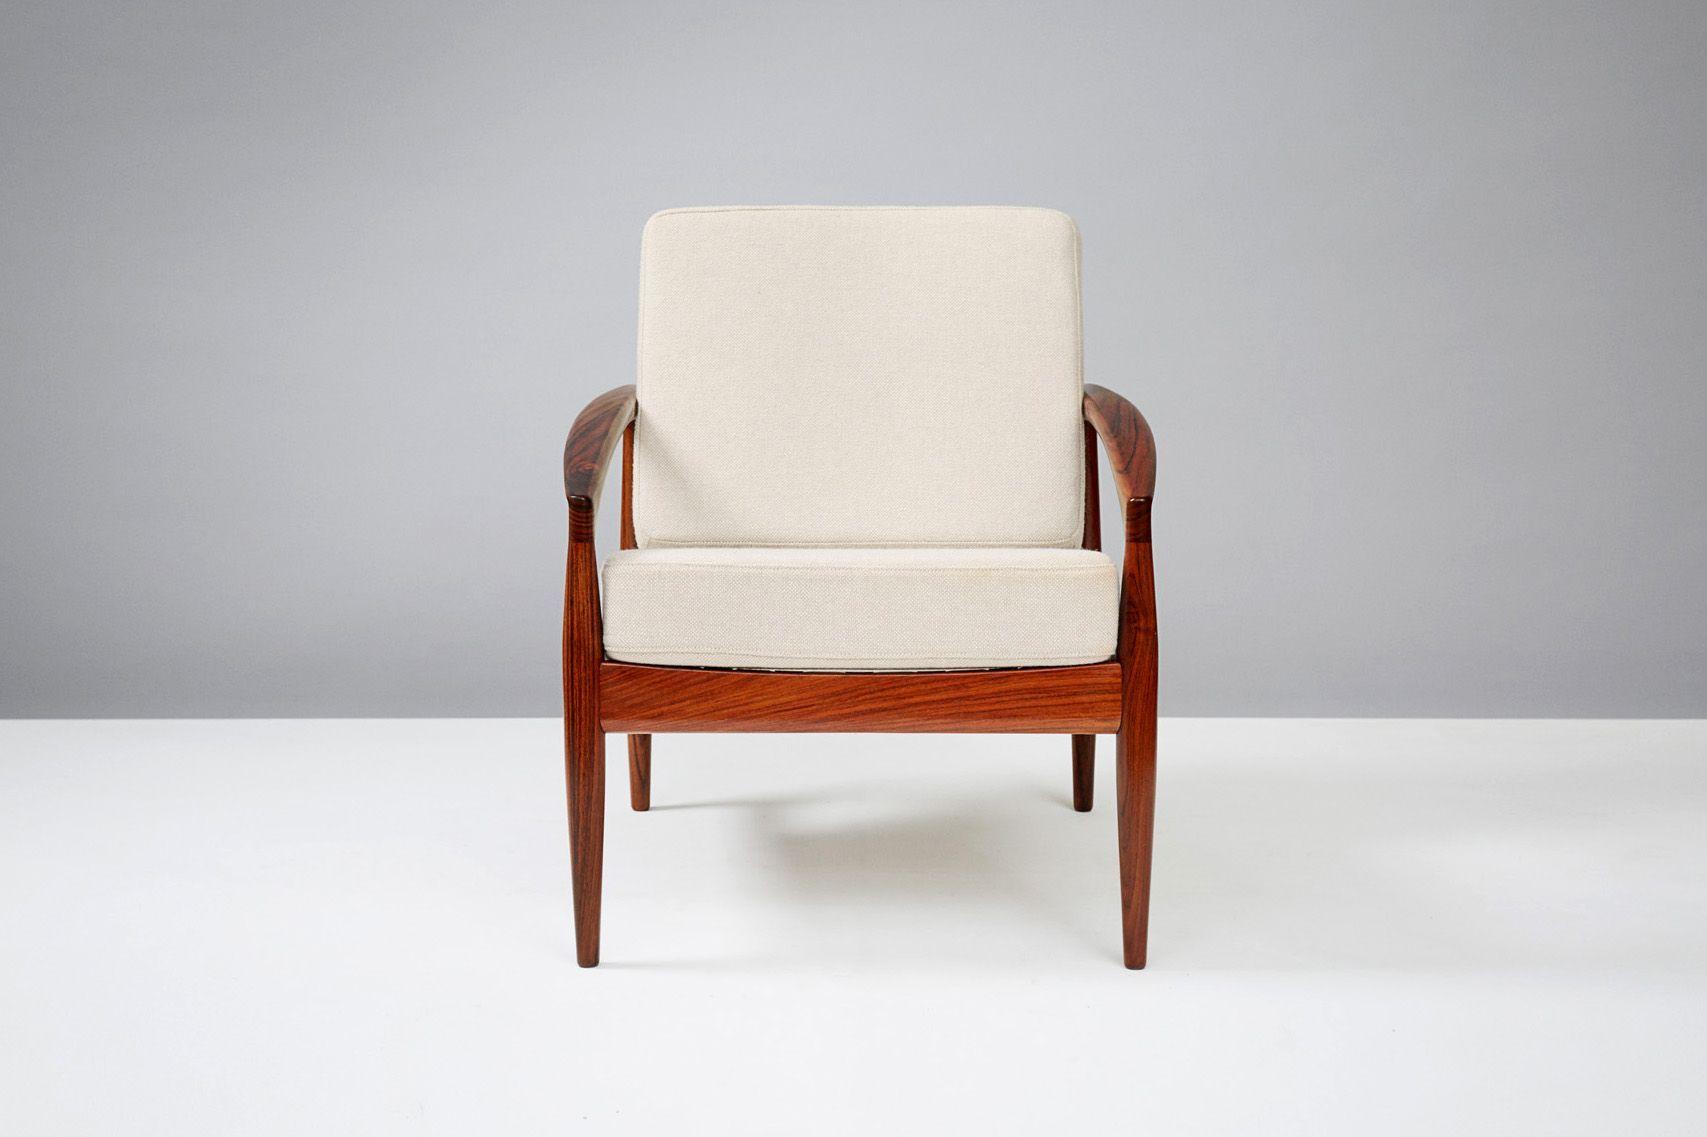 Ohrensessel Beziehen Tv Sessel Leder Beige Poang Sessel Online Kaufen Sessel Online Auf Rechnung Alte Ledersessel Pfleg Poang Sessel Sessel Ledersessel